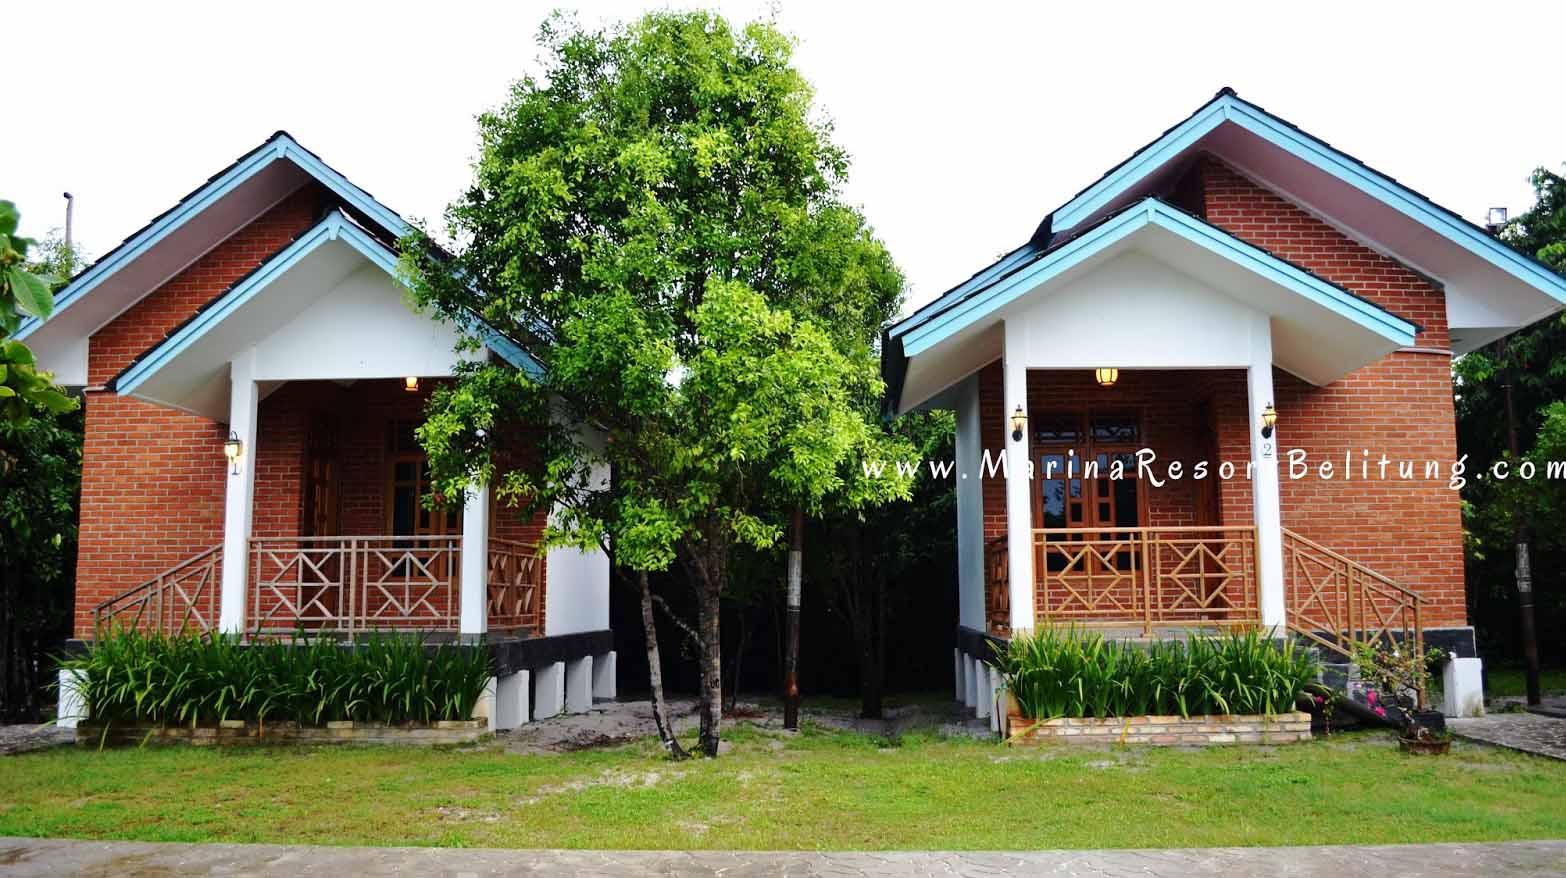 Cakra Buana Tour Bangka Belitung Tour Service Melayani Paket Wisata di Pulau Bangka dan Pulau Belitung